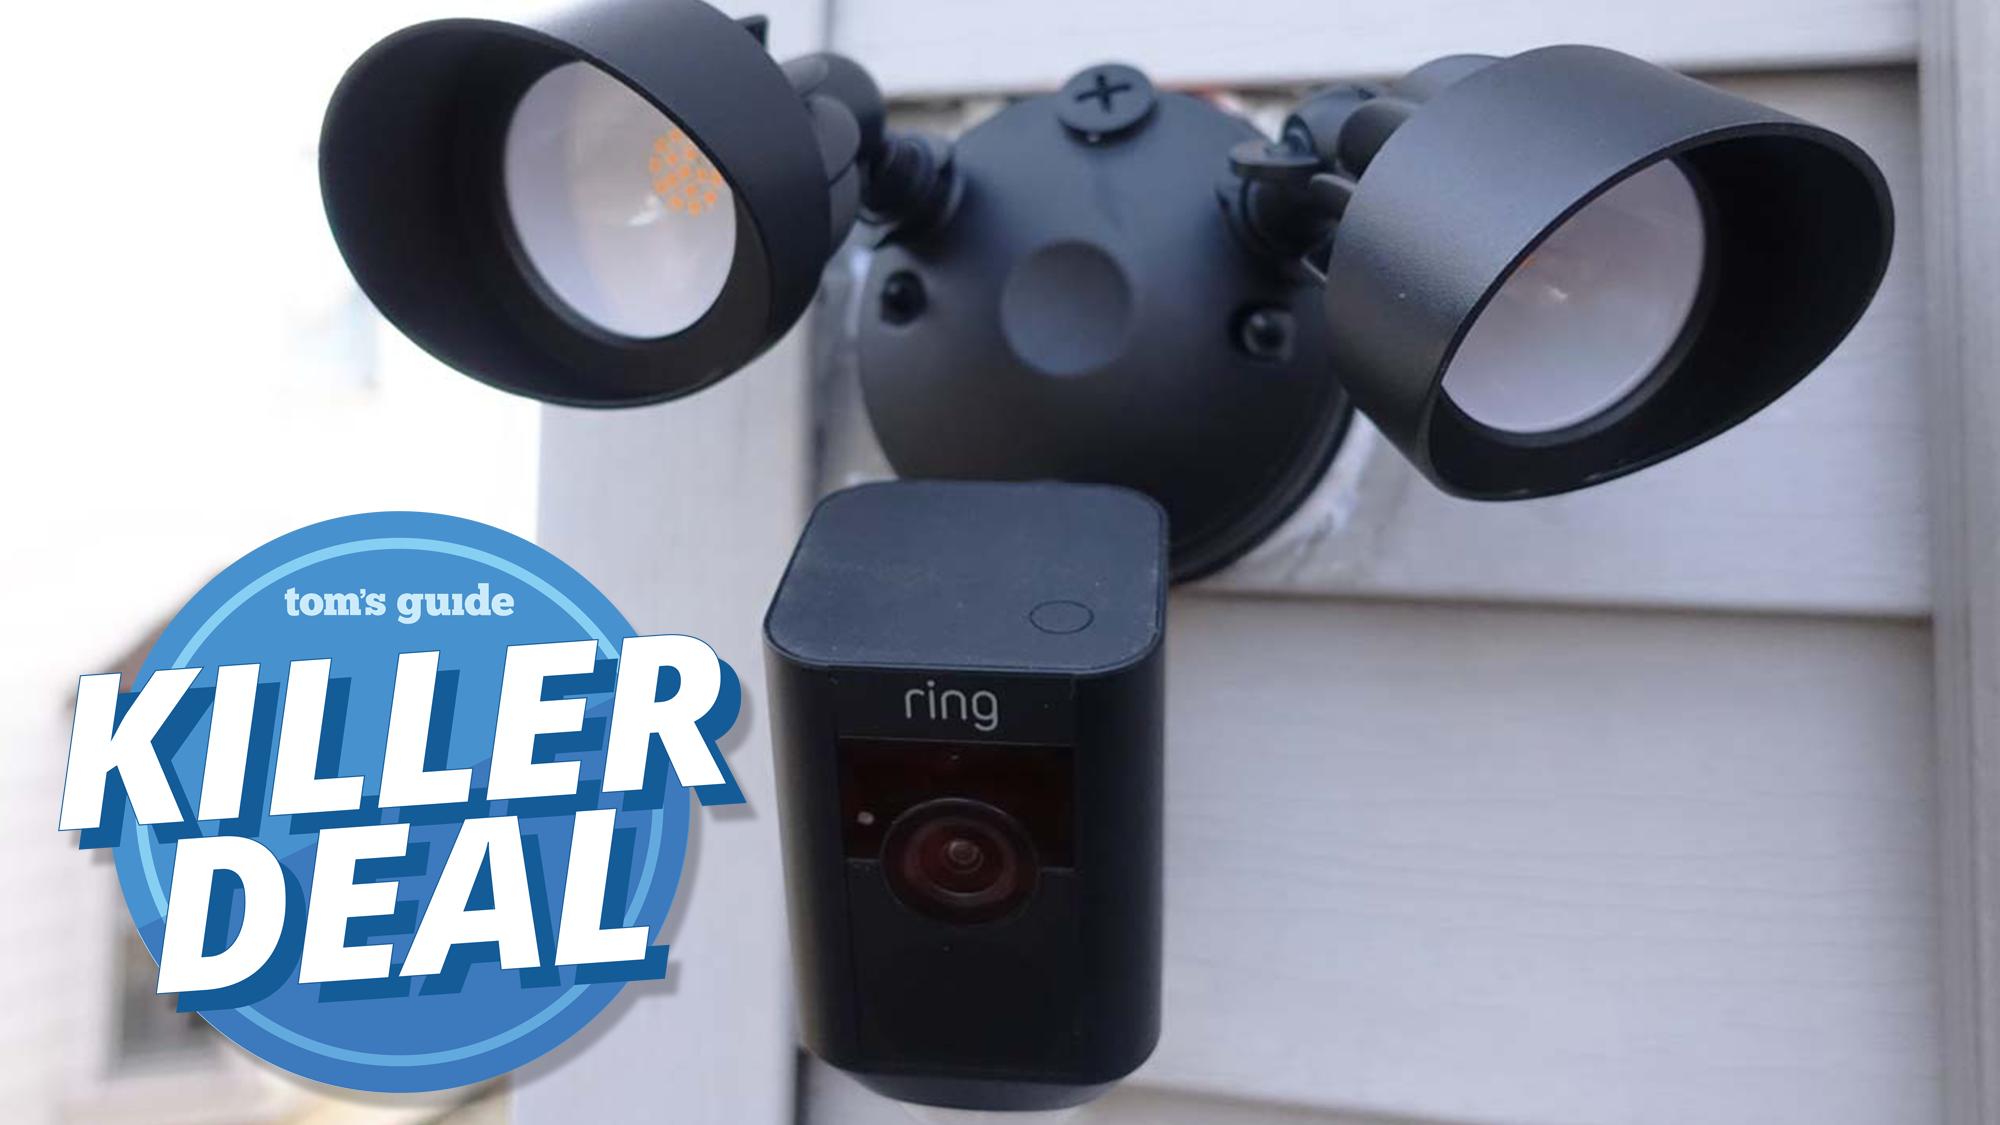 Killer Ring Deal 100 Off Ring Floodlight Camera And Echo Dot Bundle Tom S Guide